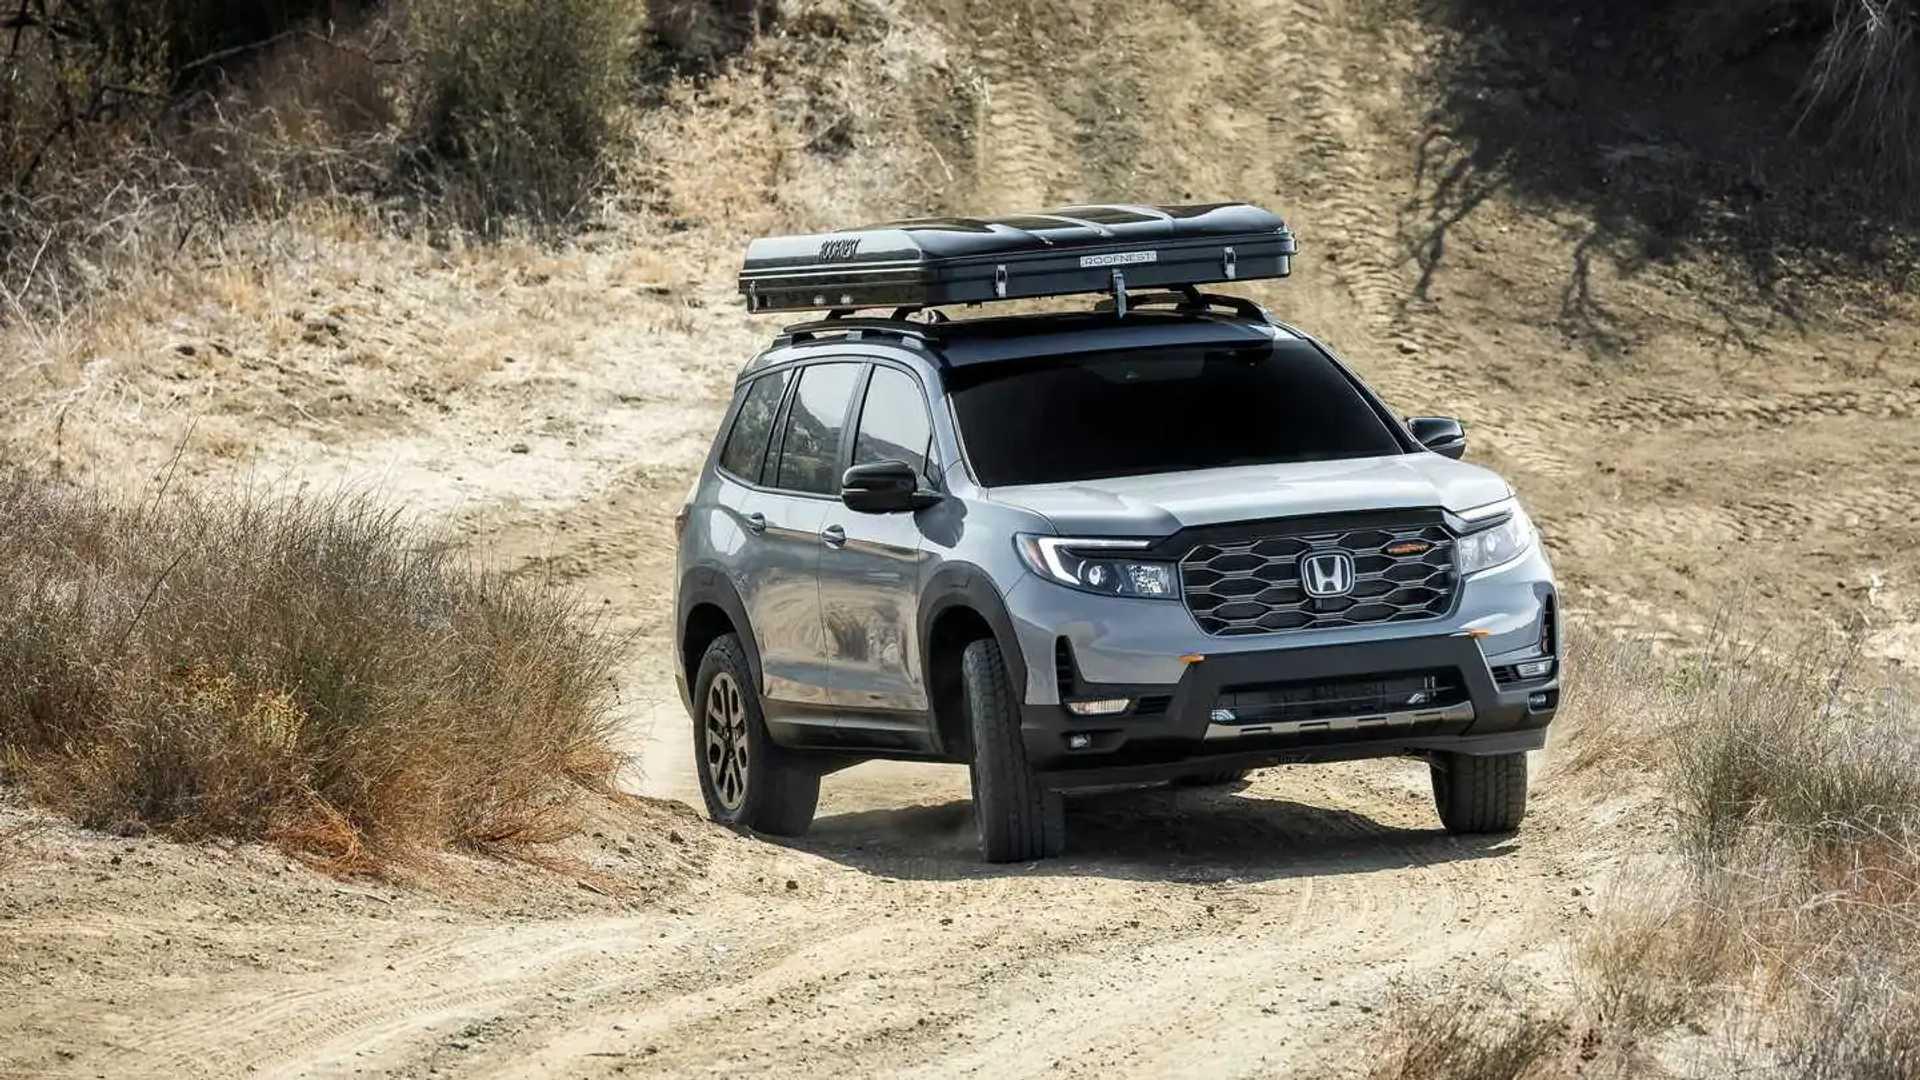 Honda Passport TrailSport Rugged Roads Project vehicle (exterior)